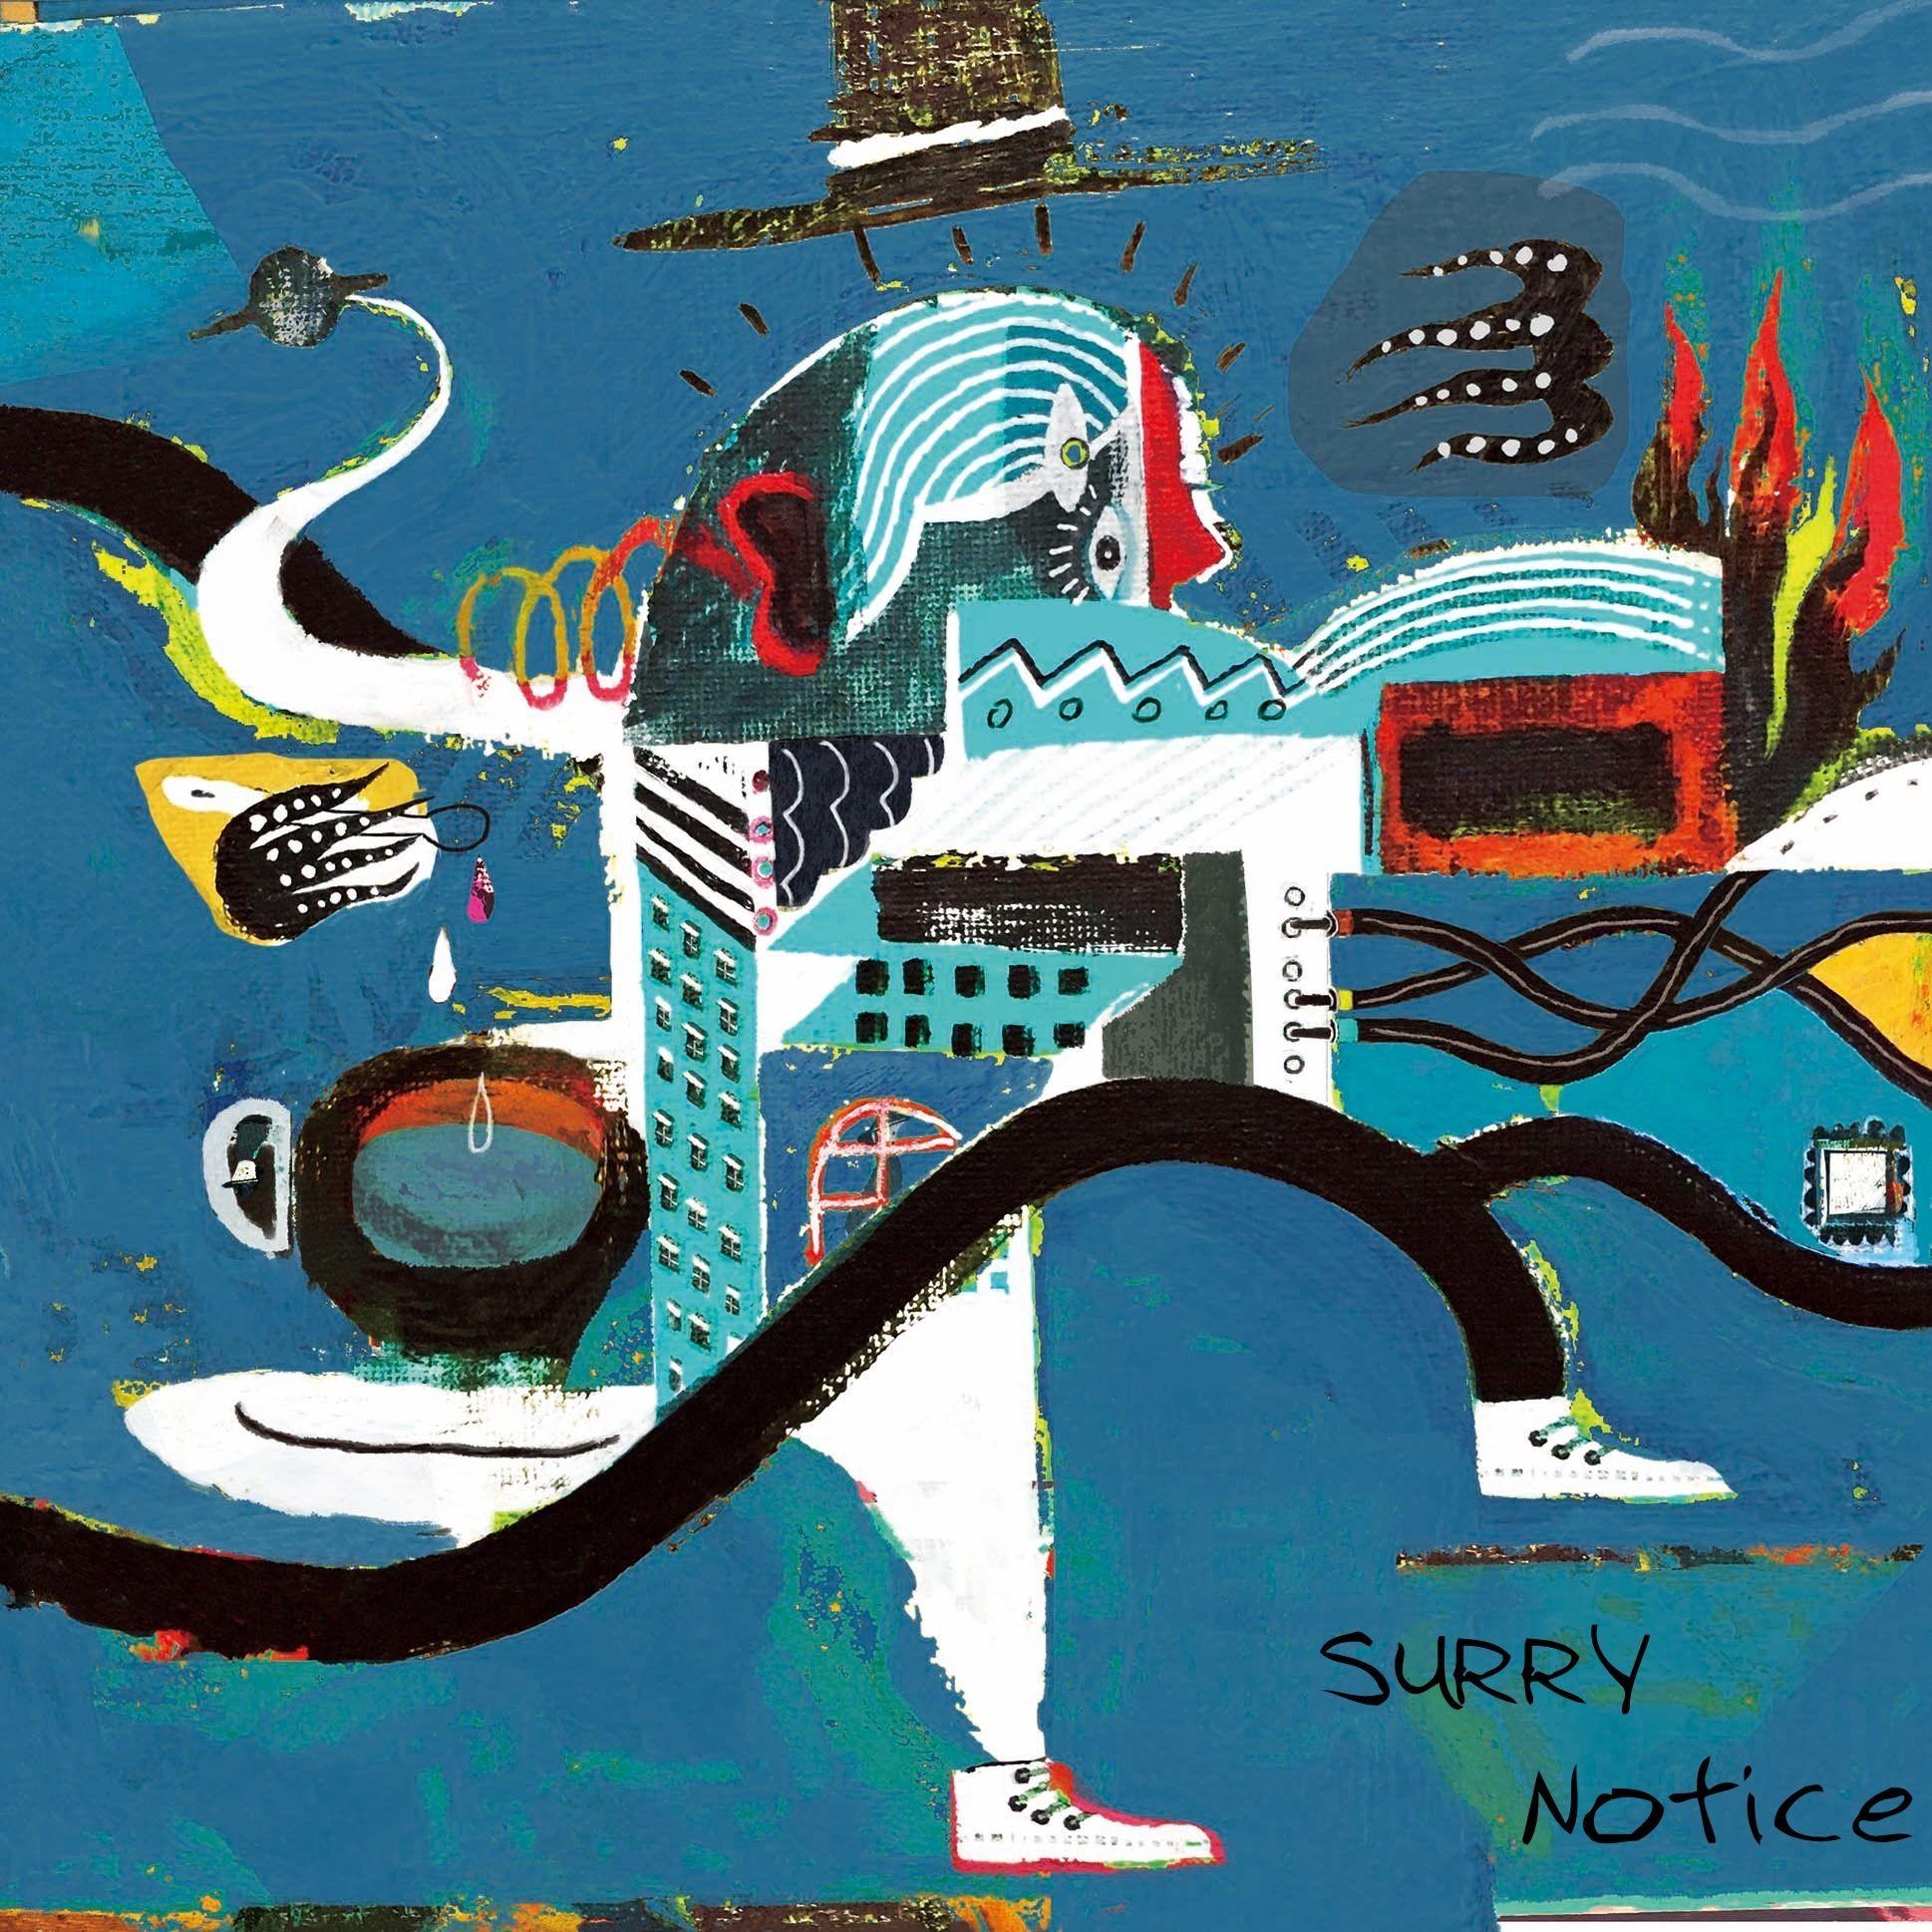 SURRY待望のニューアルバム「Notice」